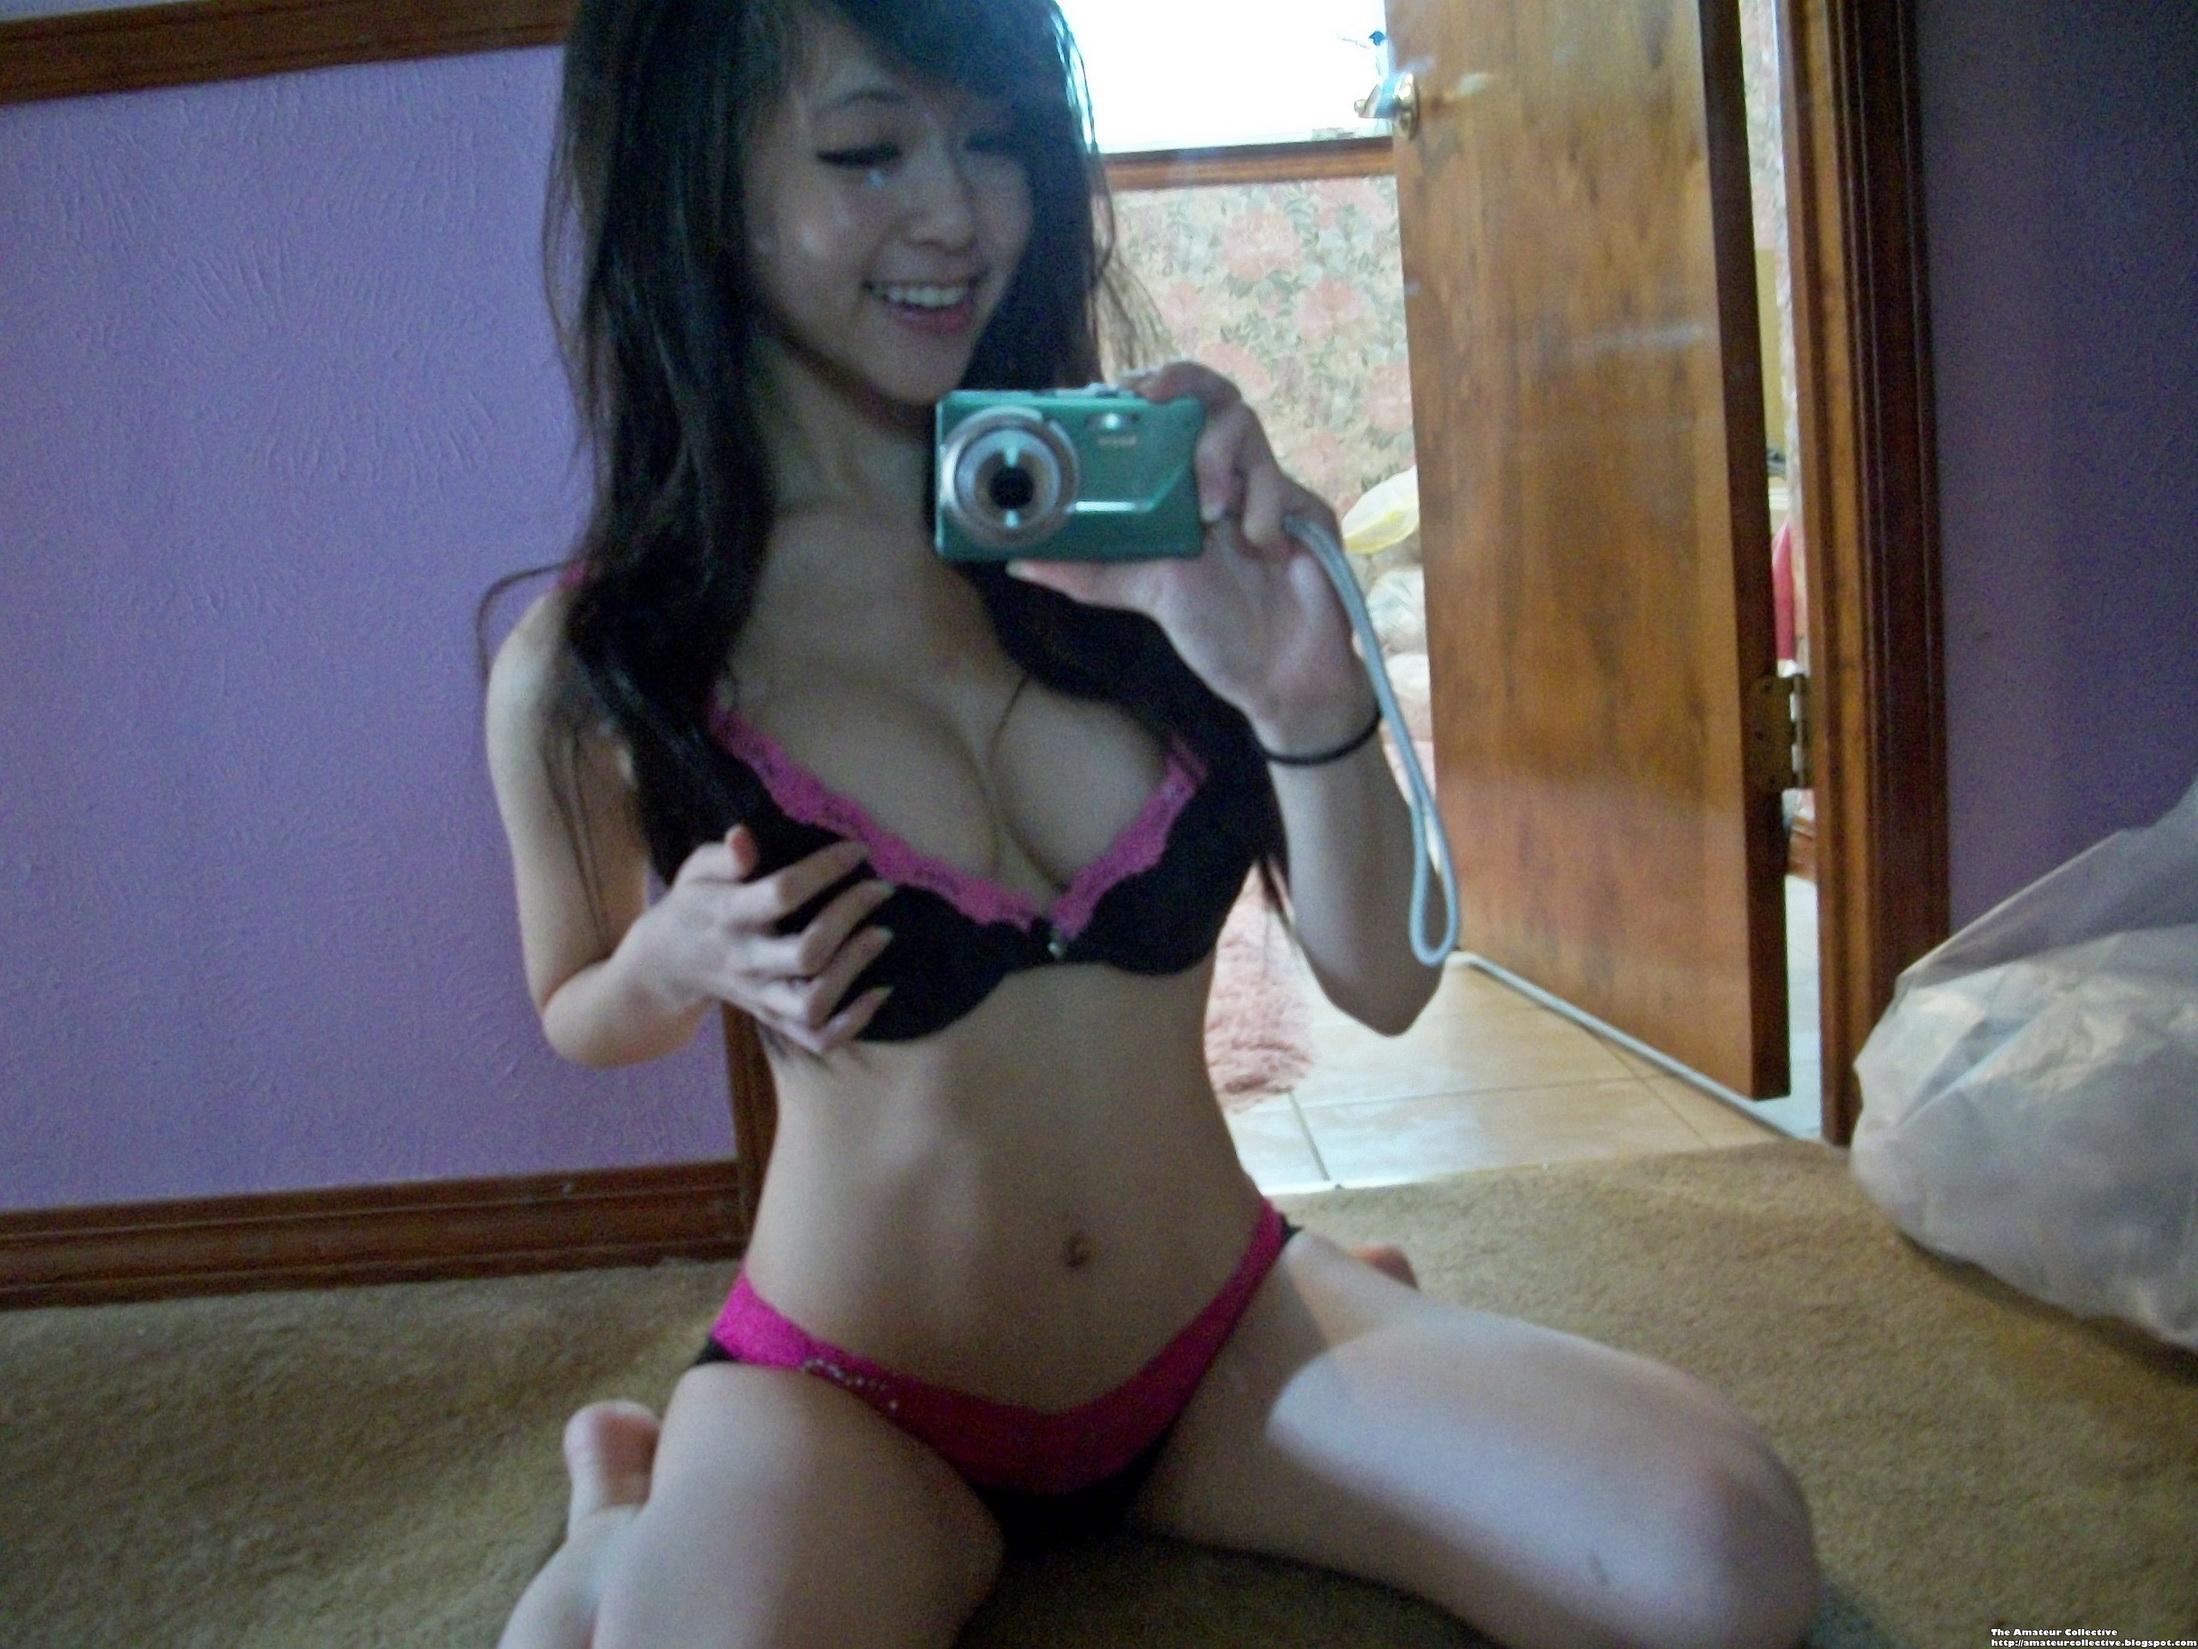 Asian Girls Nude Selfie